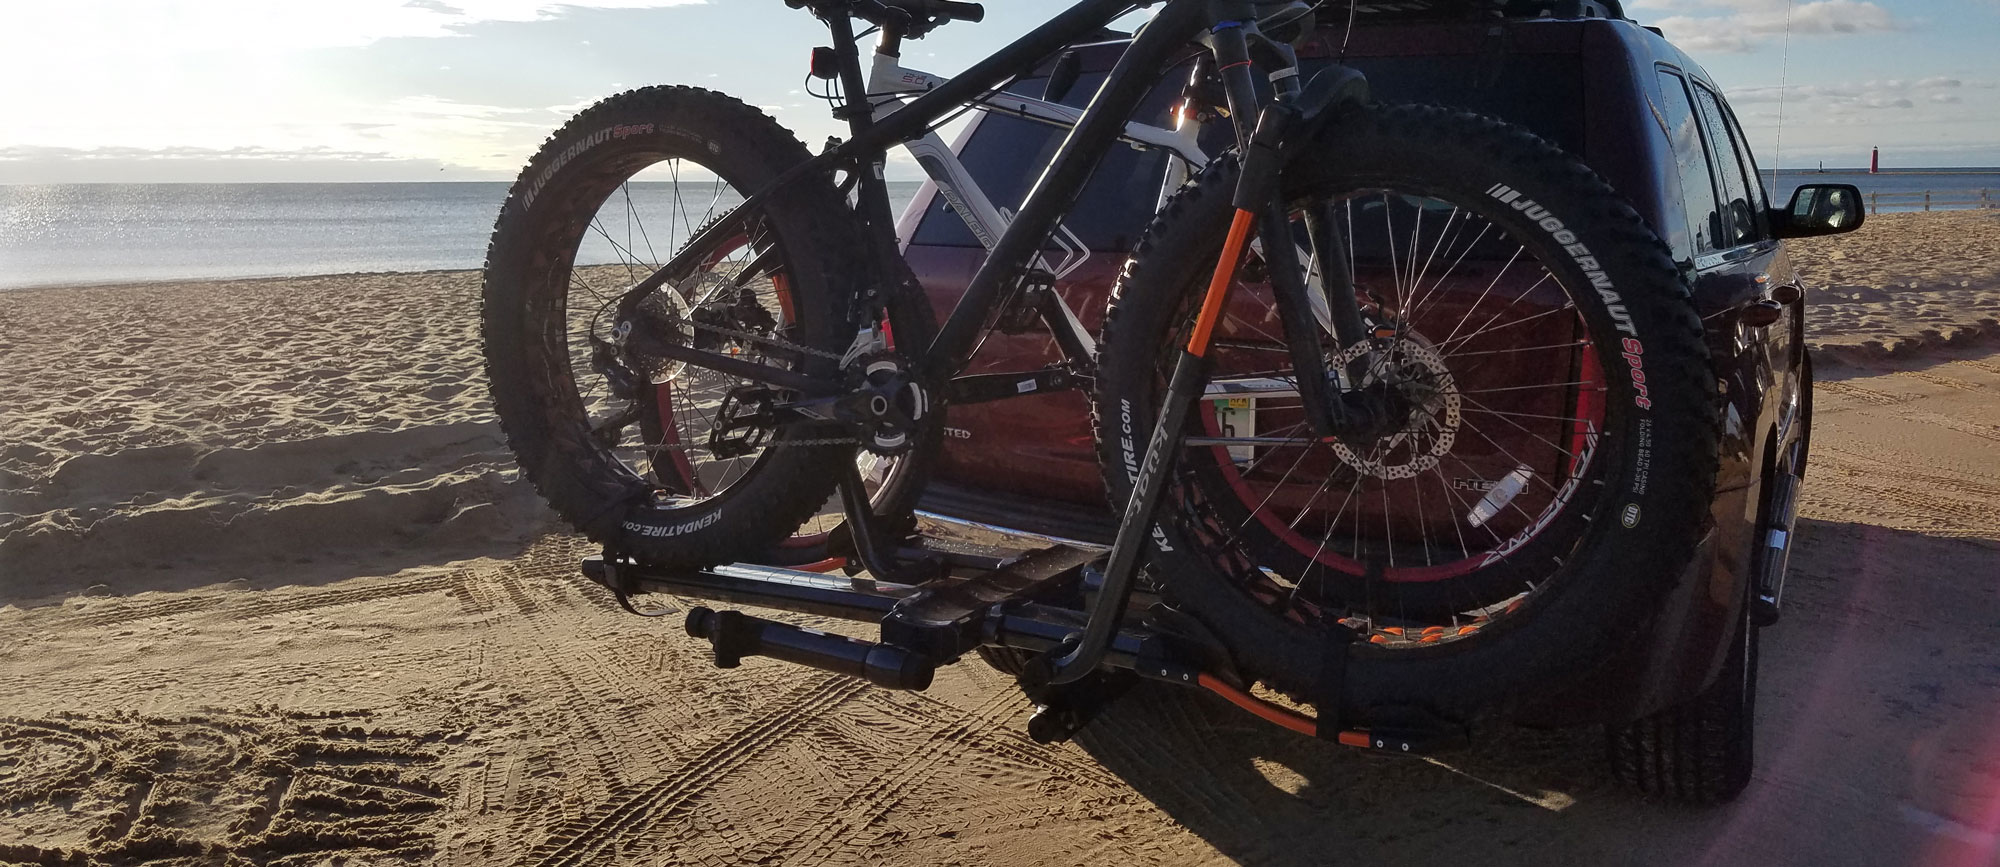 bike size beta lock alpha kit transfer hitch kuat sherpa single gunmetal review adorable full tray receiver inch of grey bikes rack